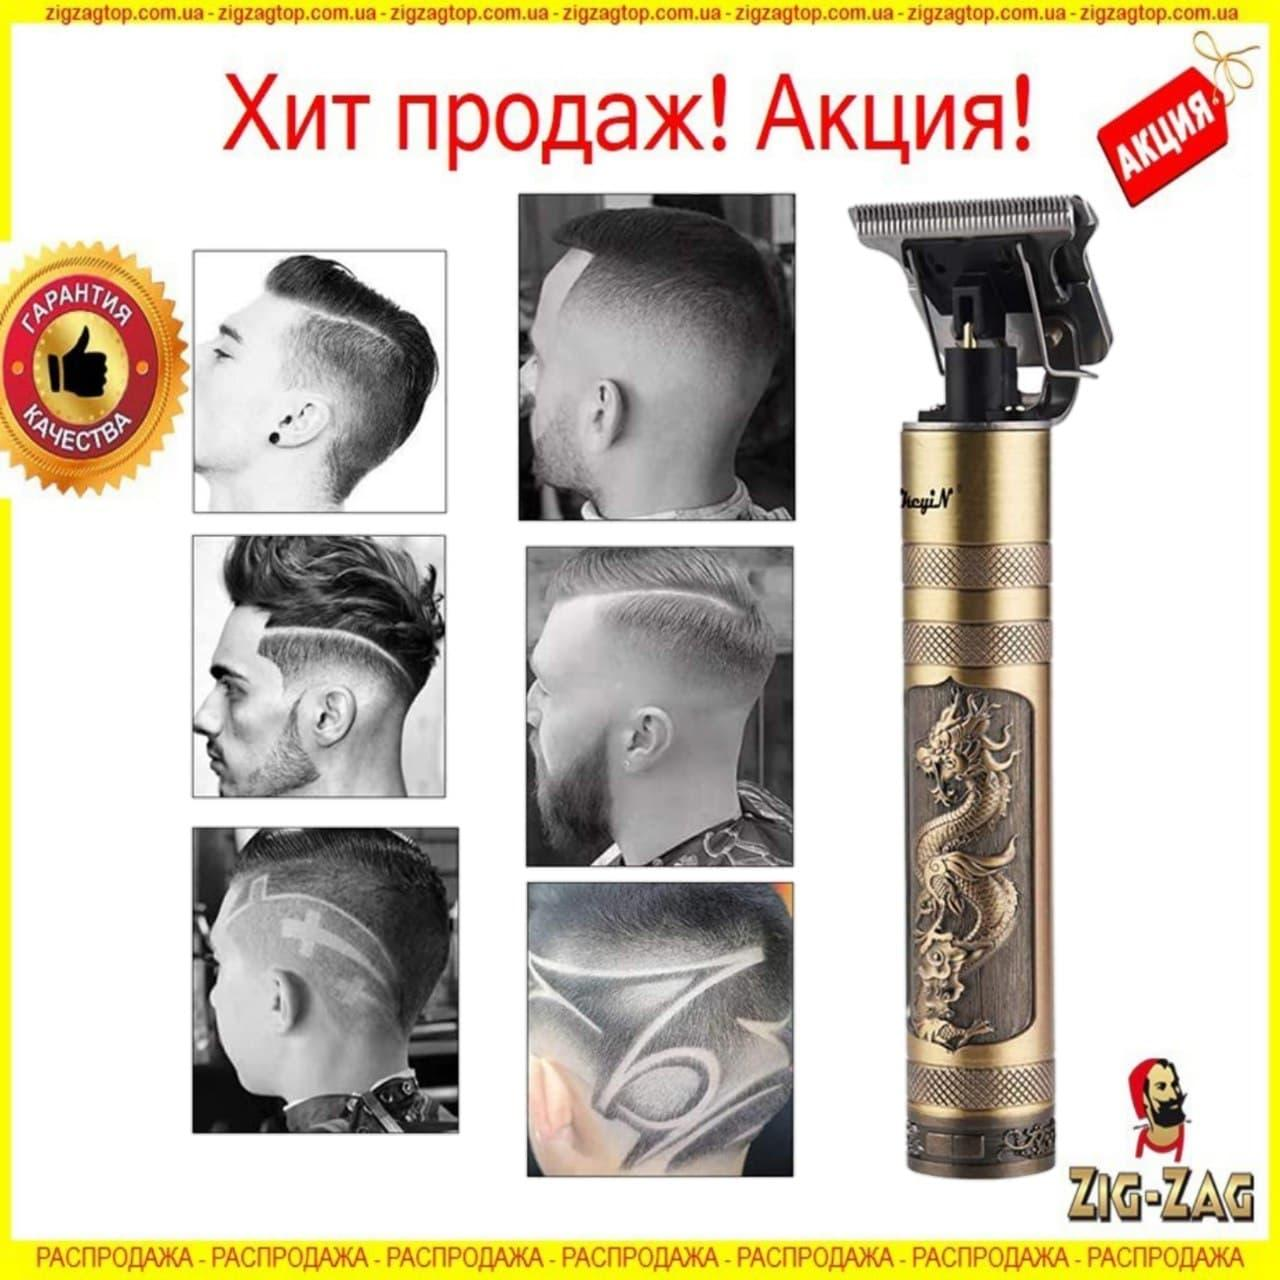 Професійна Машинка для Стрижки Vintage T99 Окантовочна волосся Голови, Бороди t9 Бритва Тример Окаточная